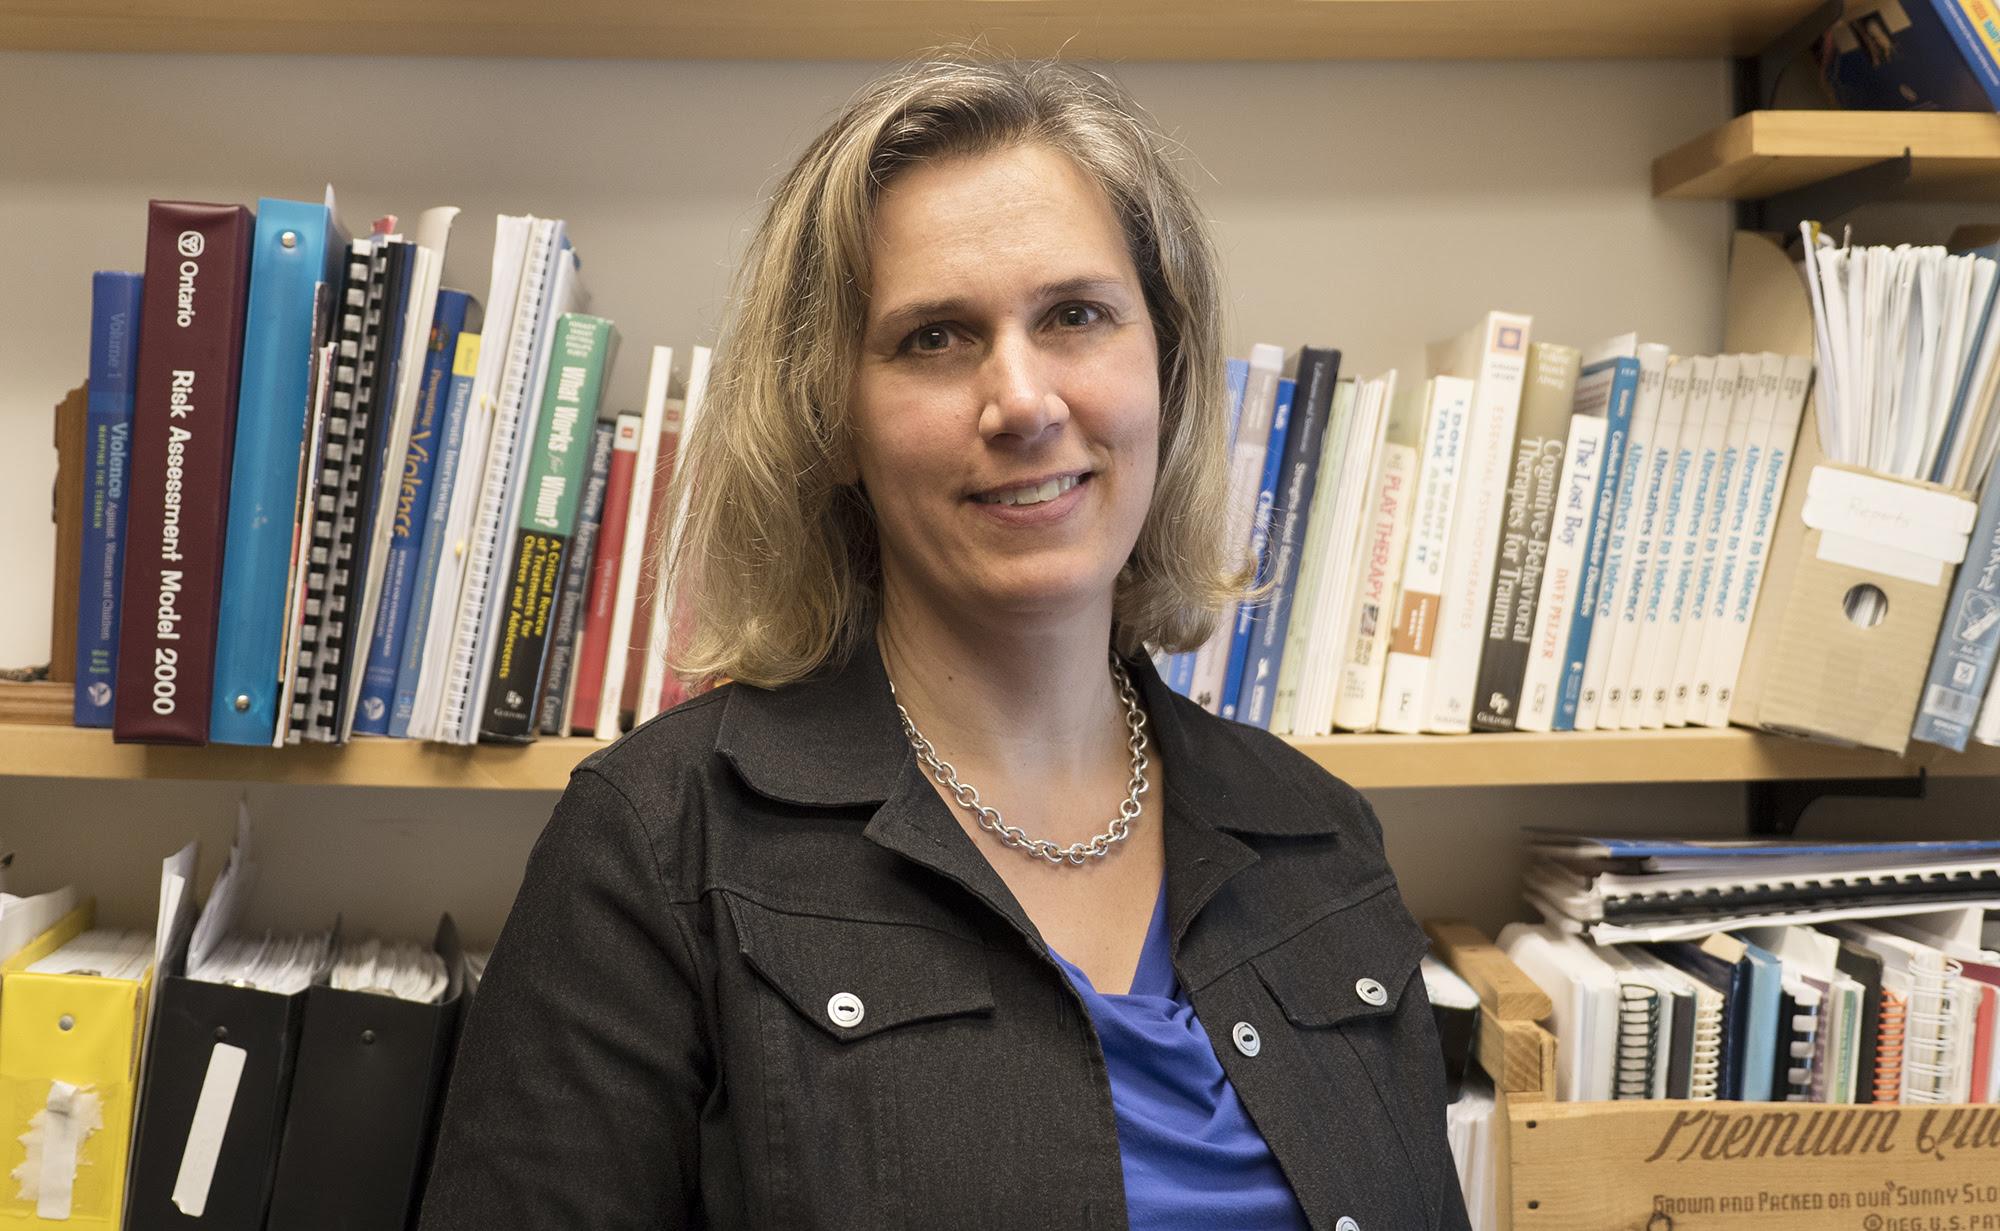 OISE :: Schools must become hub of mental health support says OISE professor Katreena Scott ...